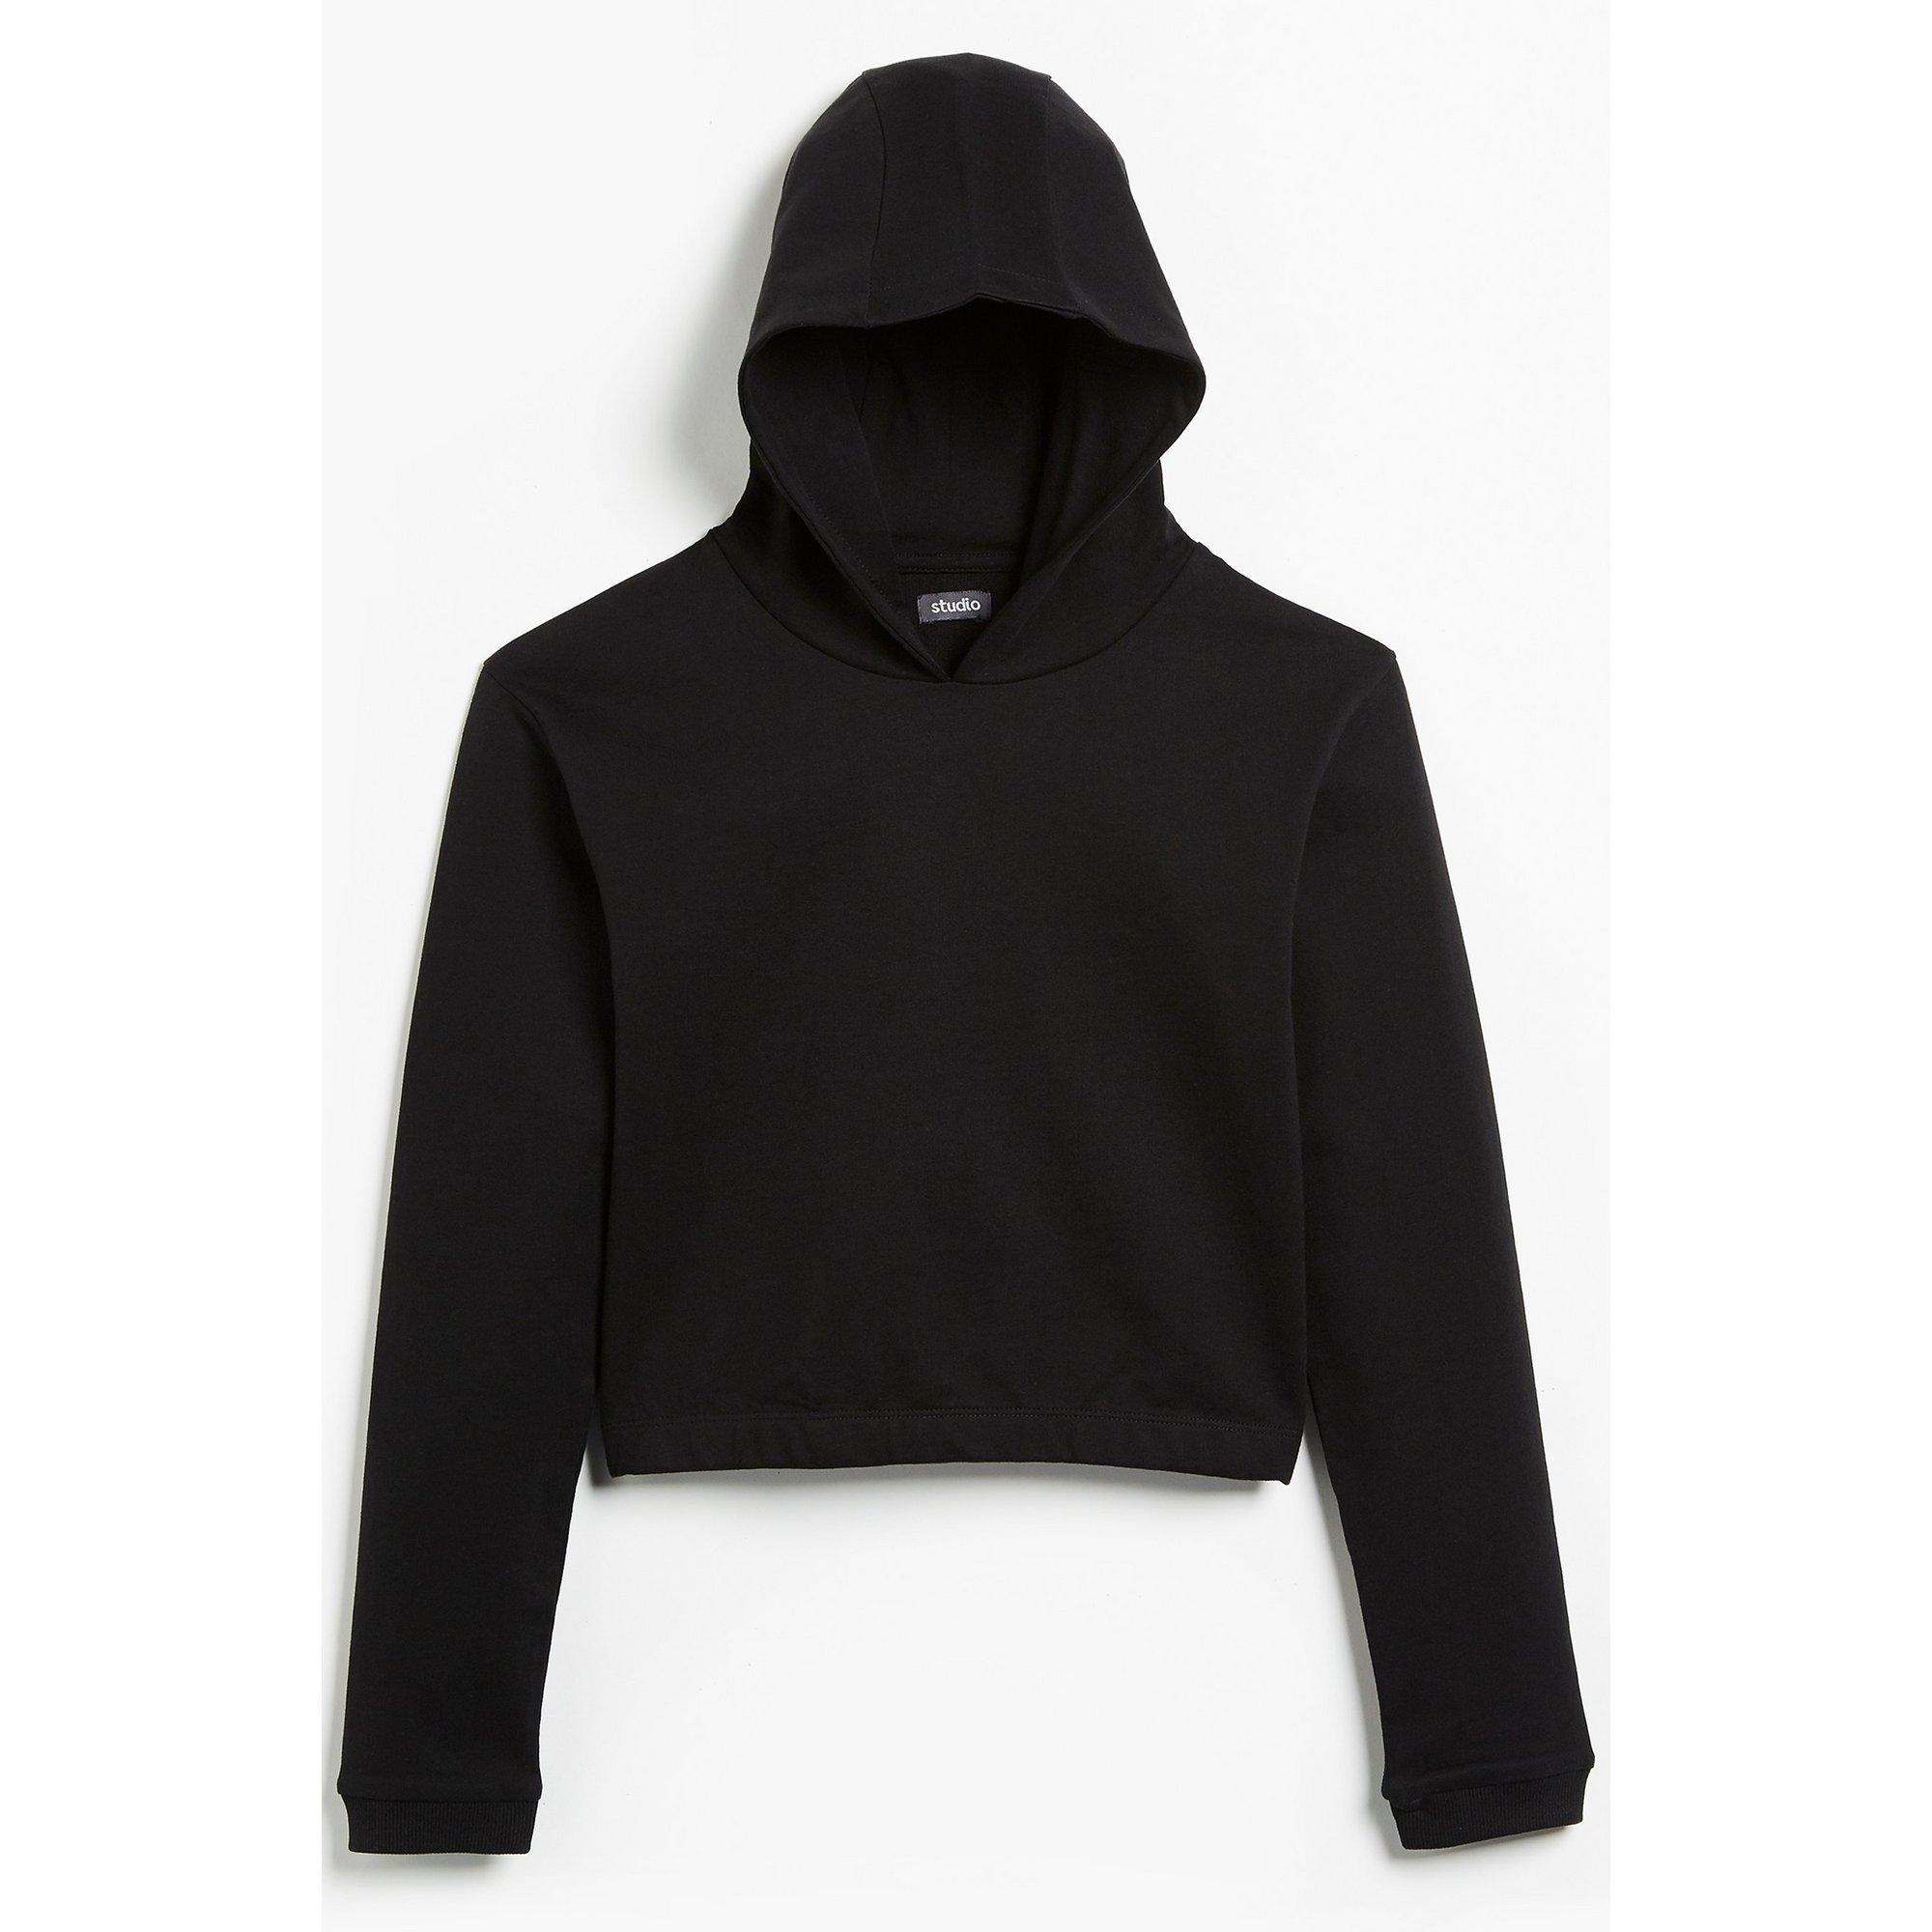 Image of Girls Essentials Black Cropped Hoody